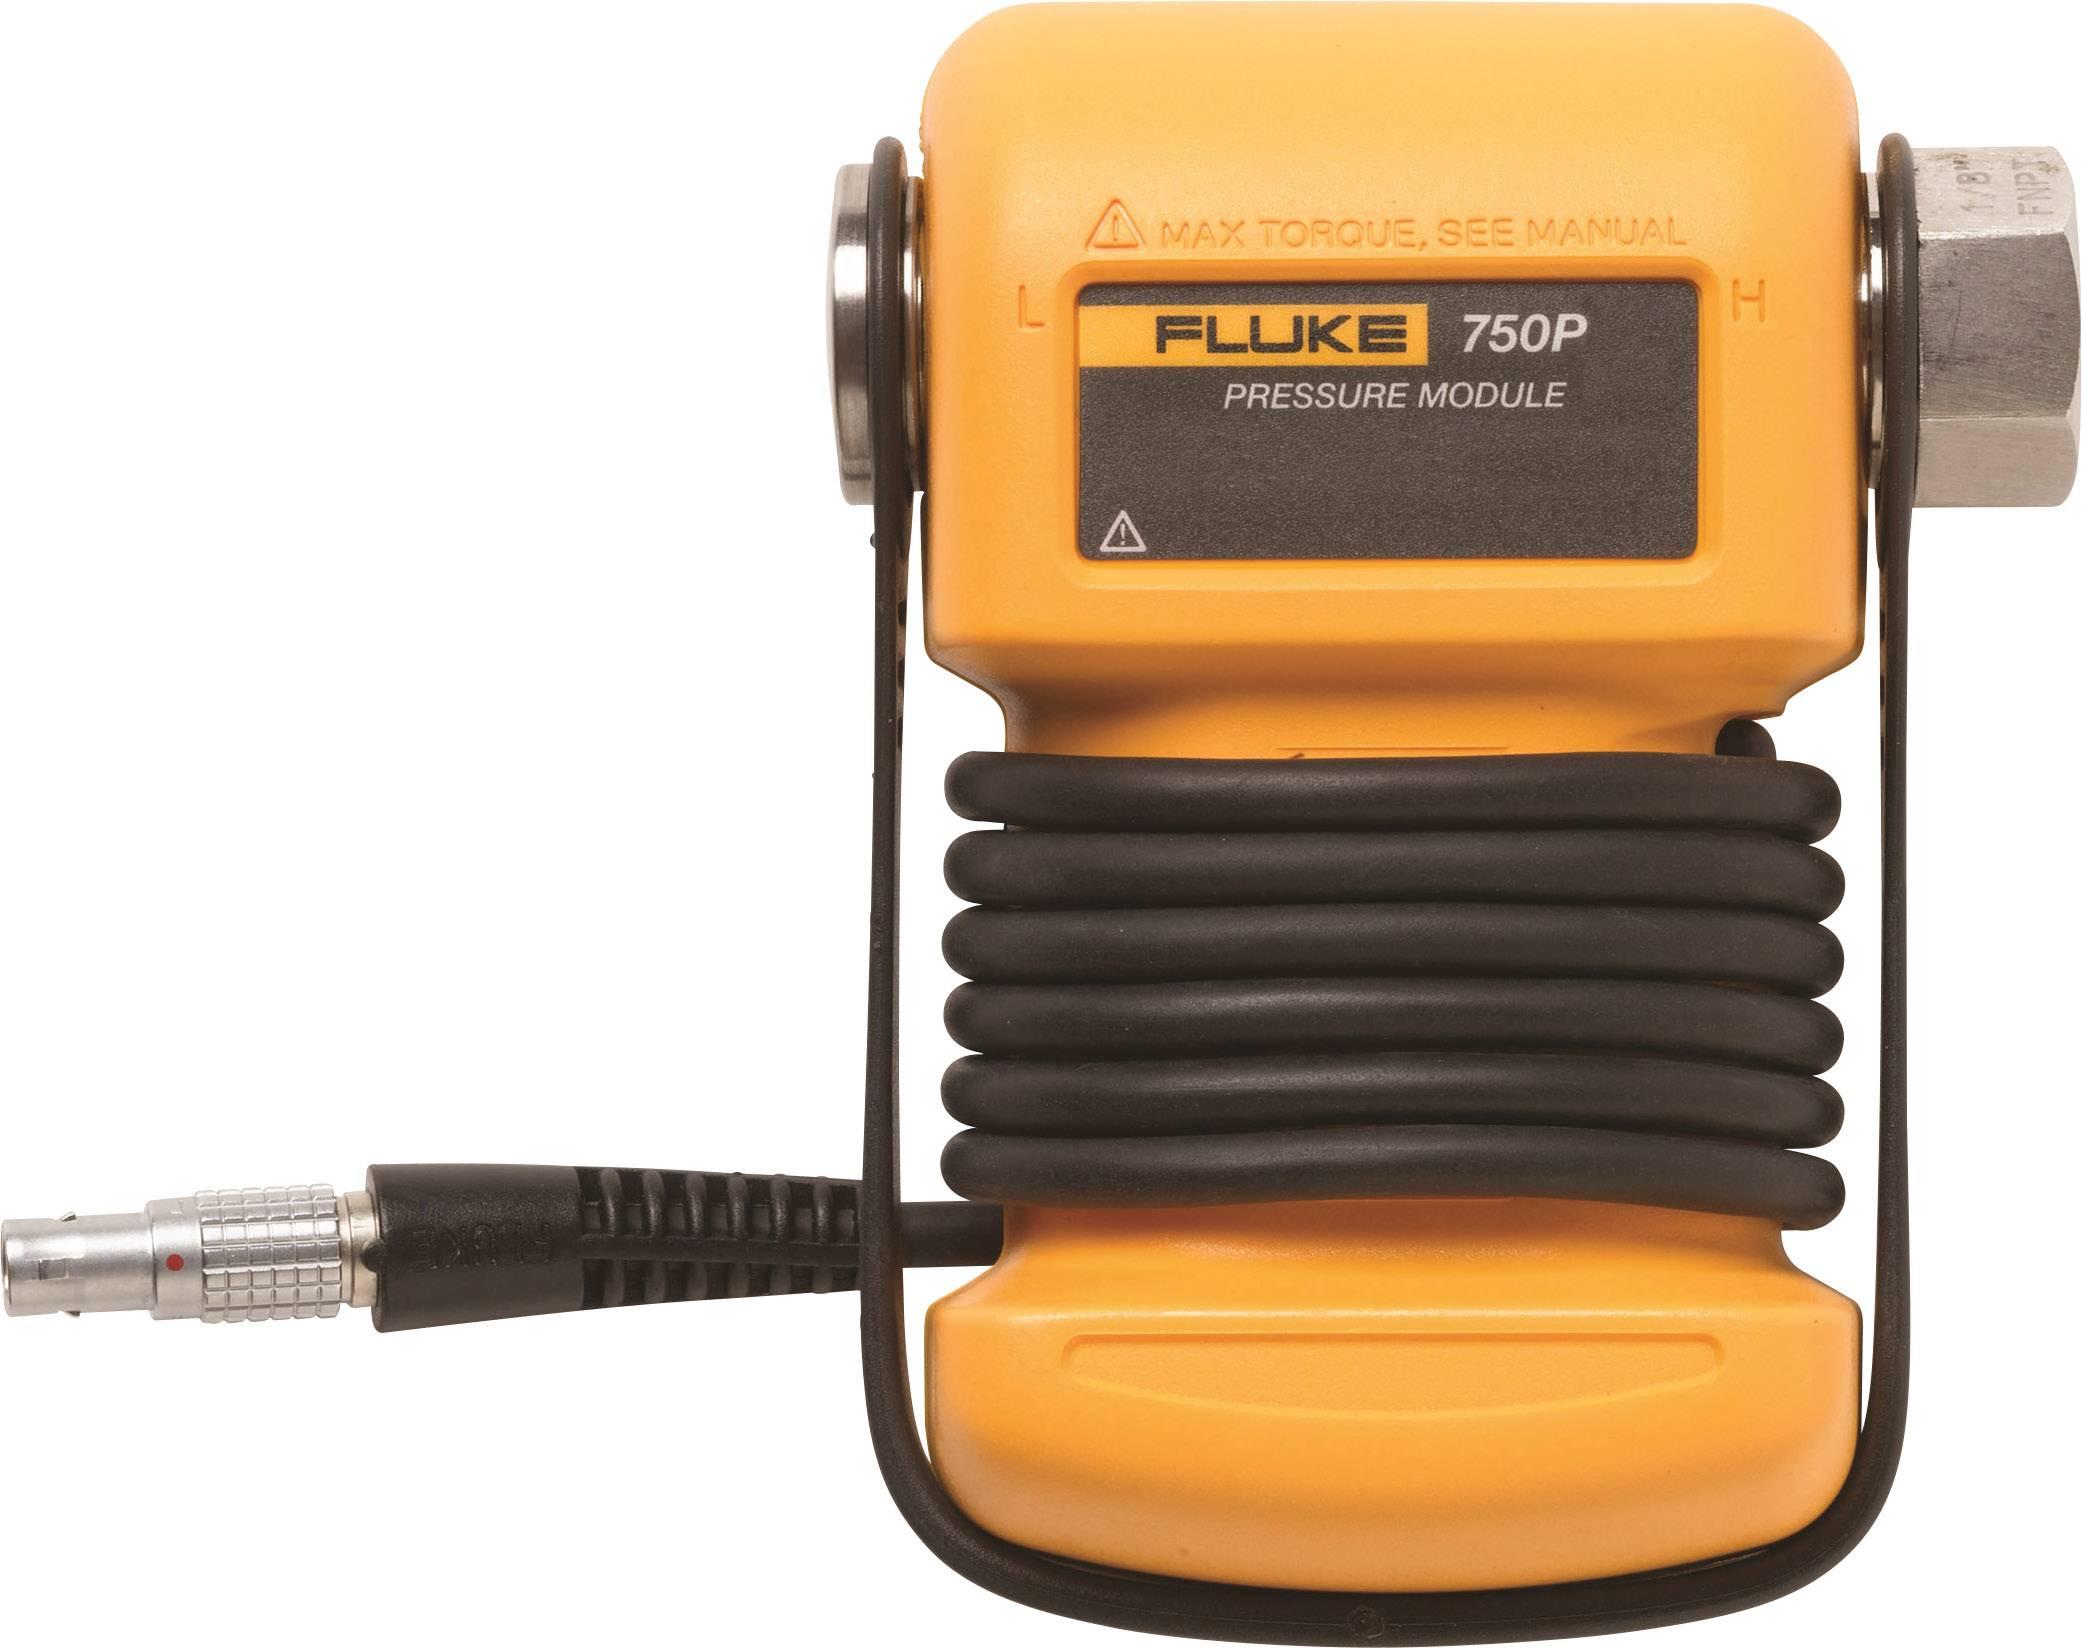 Tlakový modul Fluke 750P09